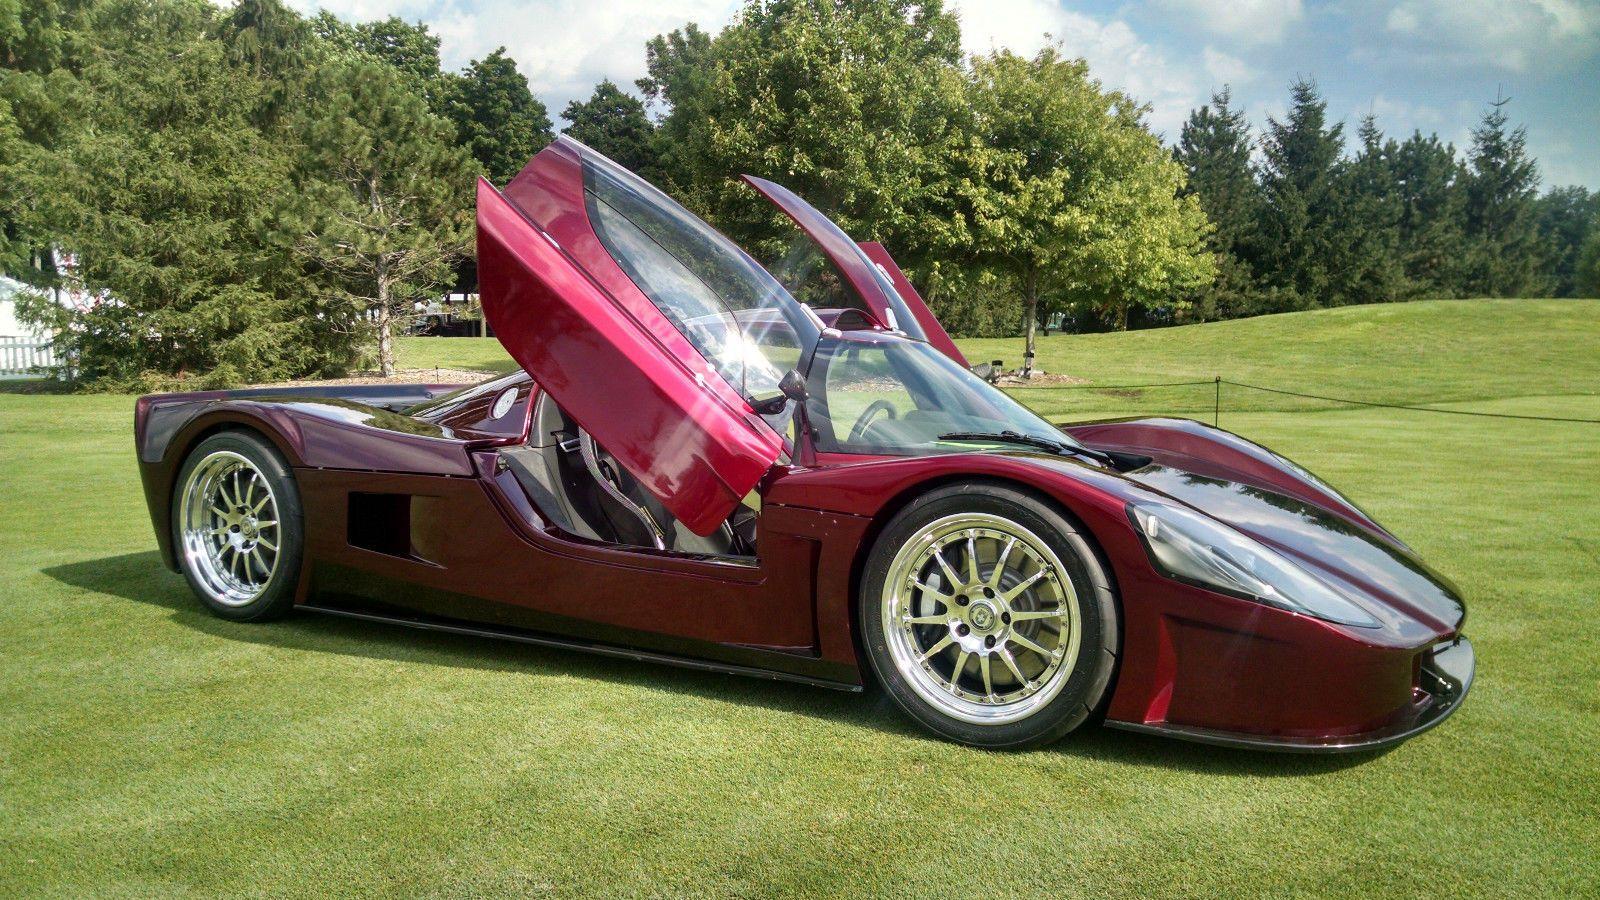 2011 RCR SLC Superlite Coupe SL C 750 HP 6 Stage Dry Sump Ac/heat ...